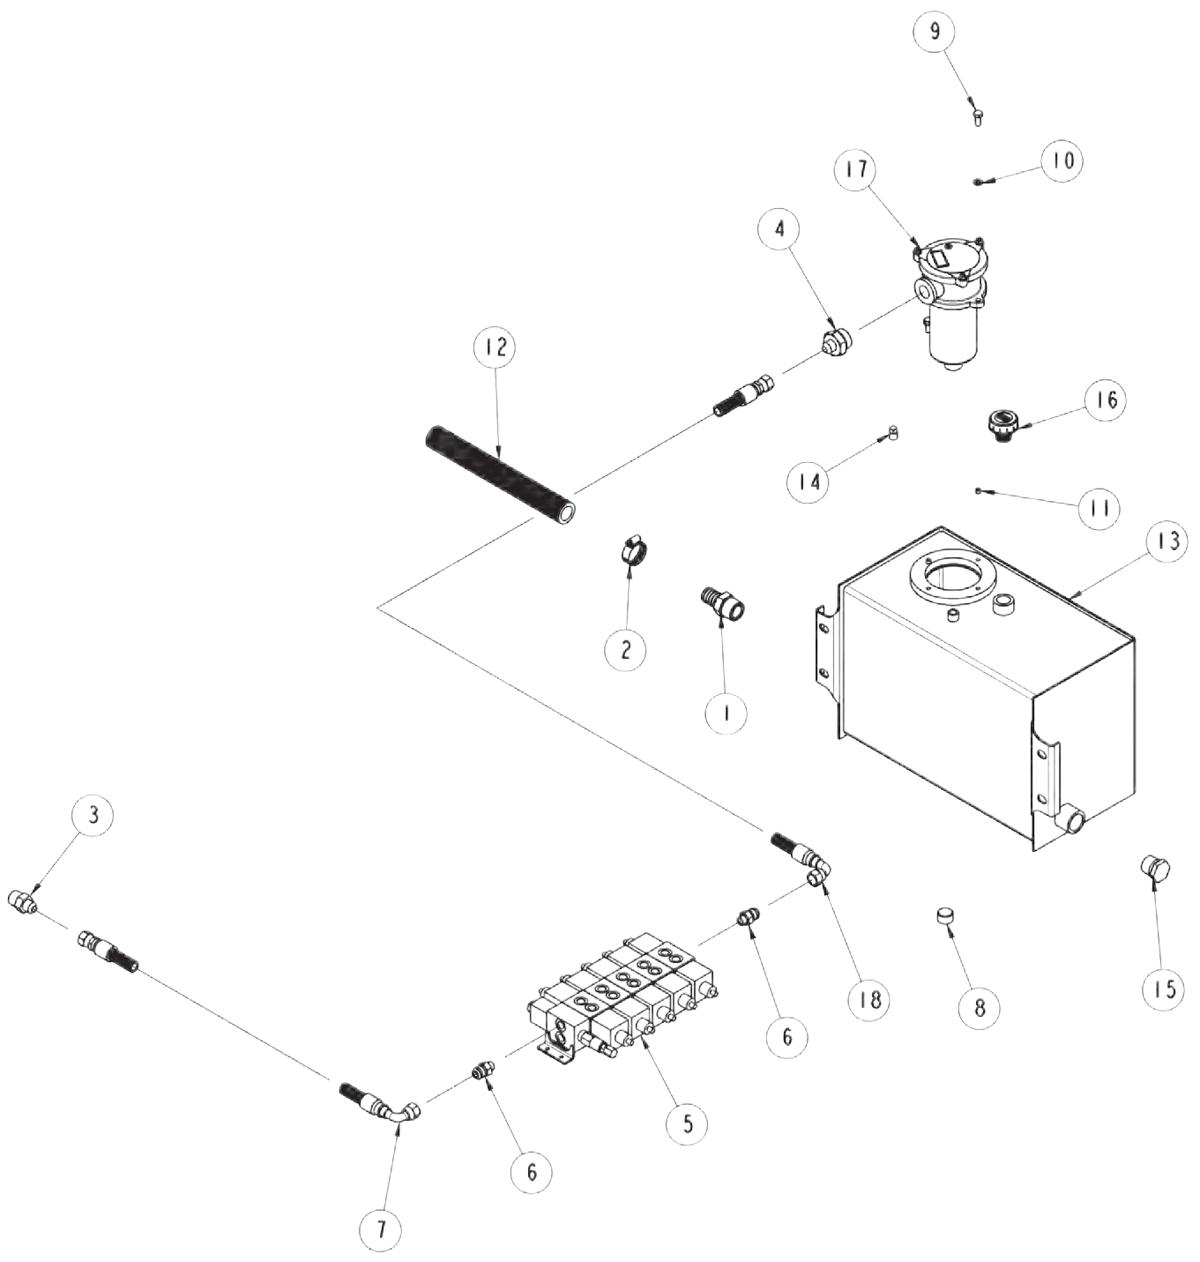 ... 810 power tilt tank hydraulics rh zips com 230V Single Phase Wiring  Diagram Hydraulic Solenoid Valve